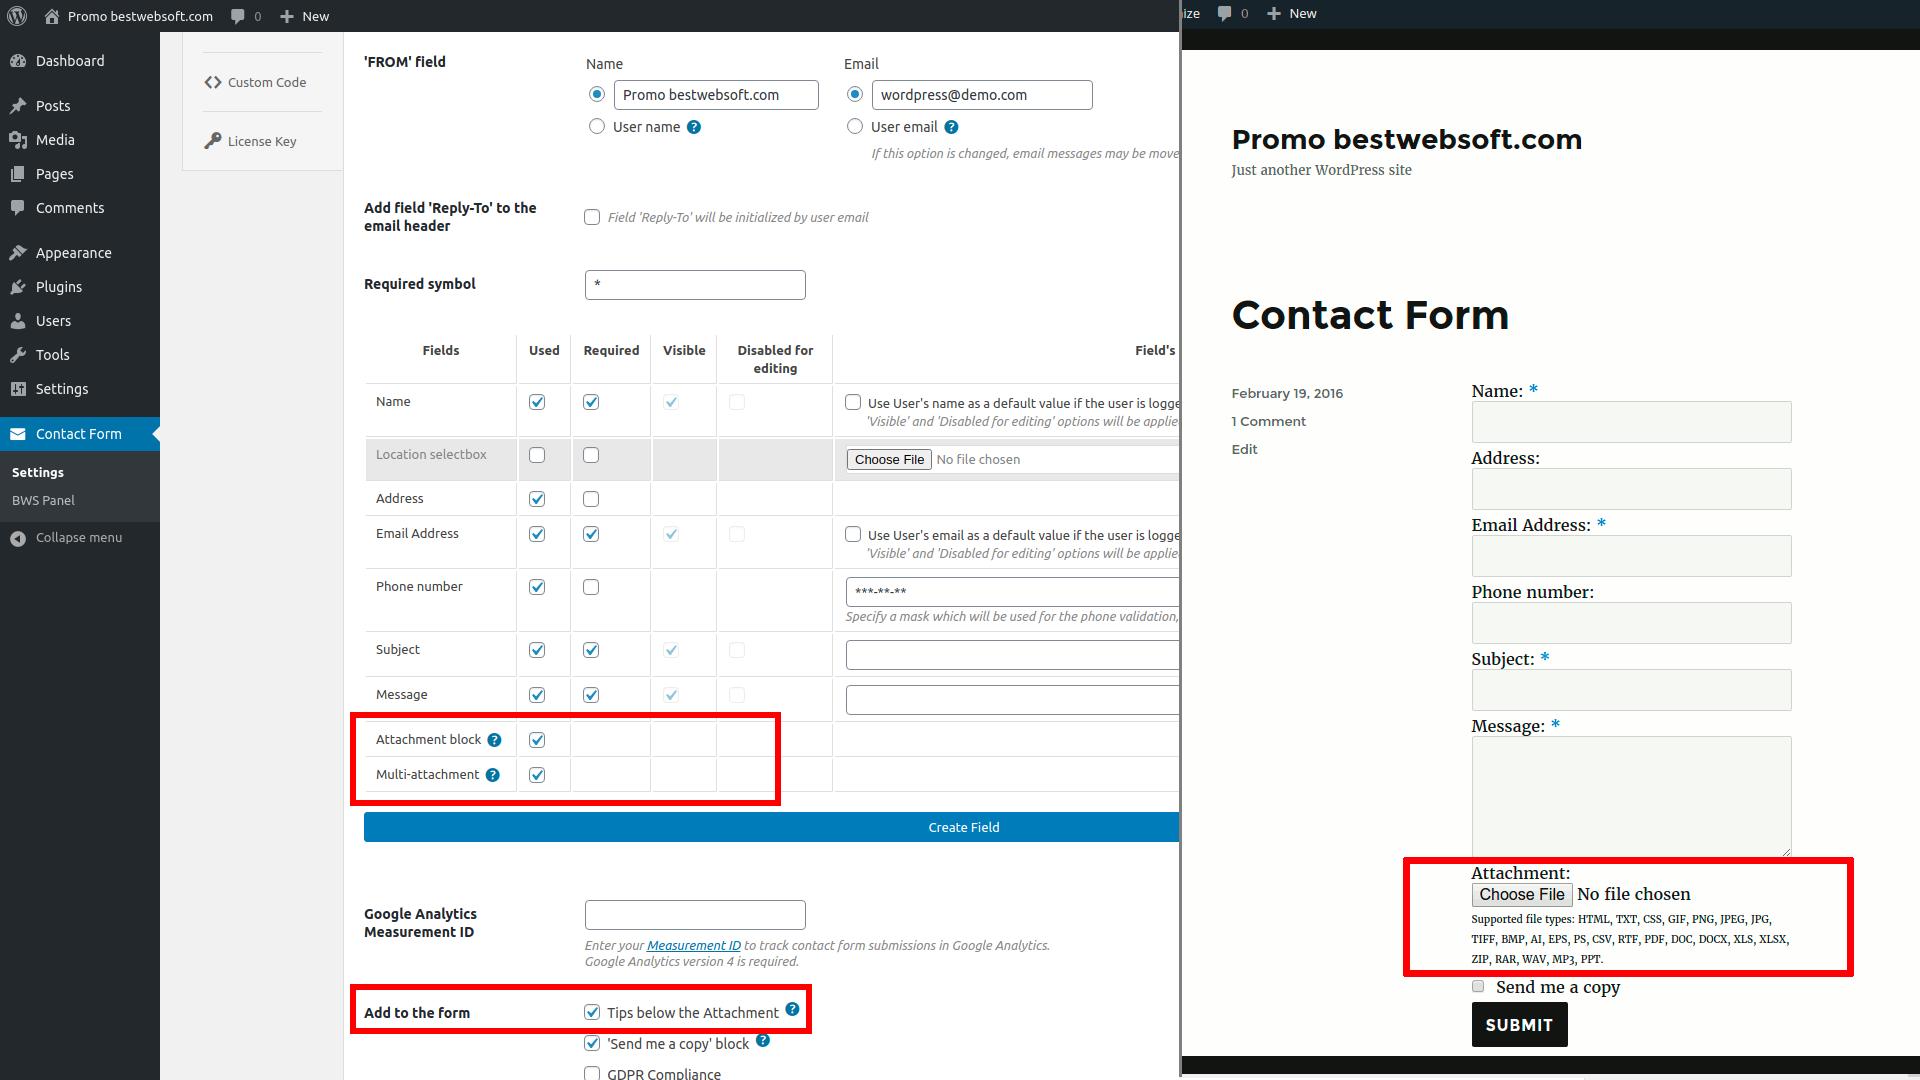 contact form screenshot 16